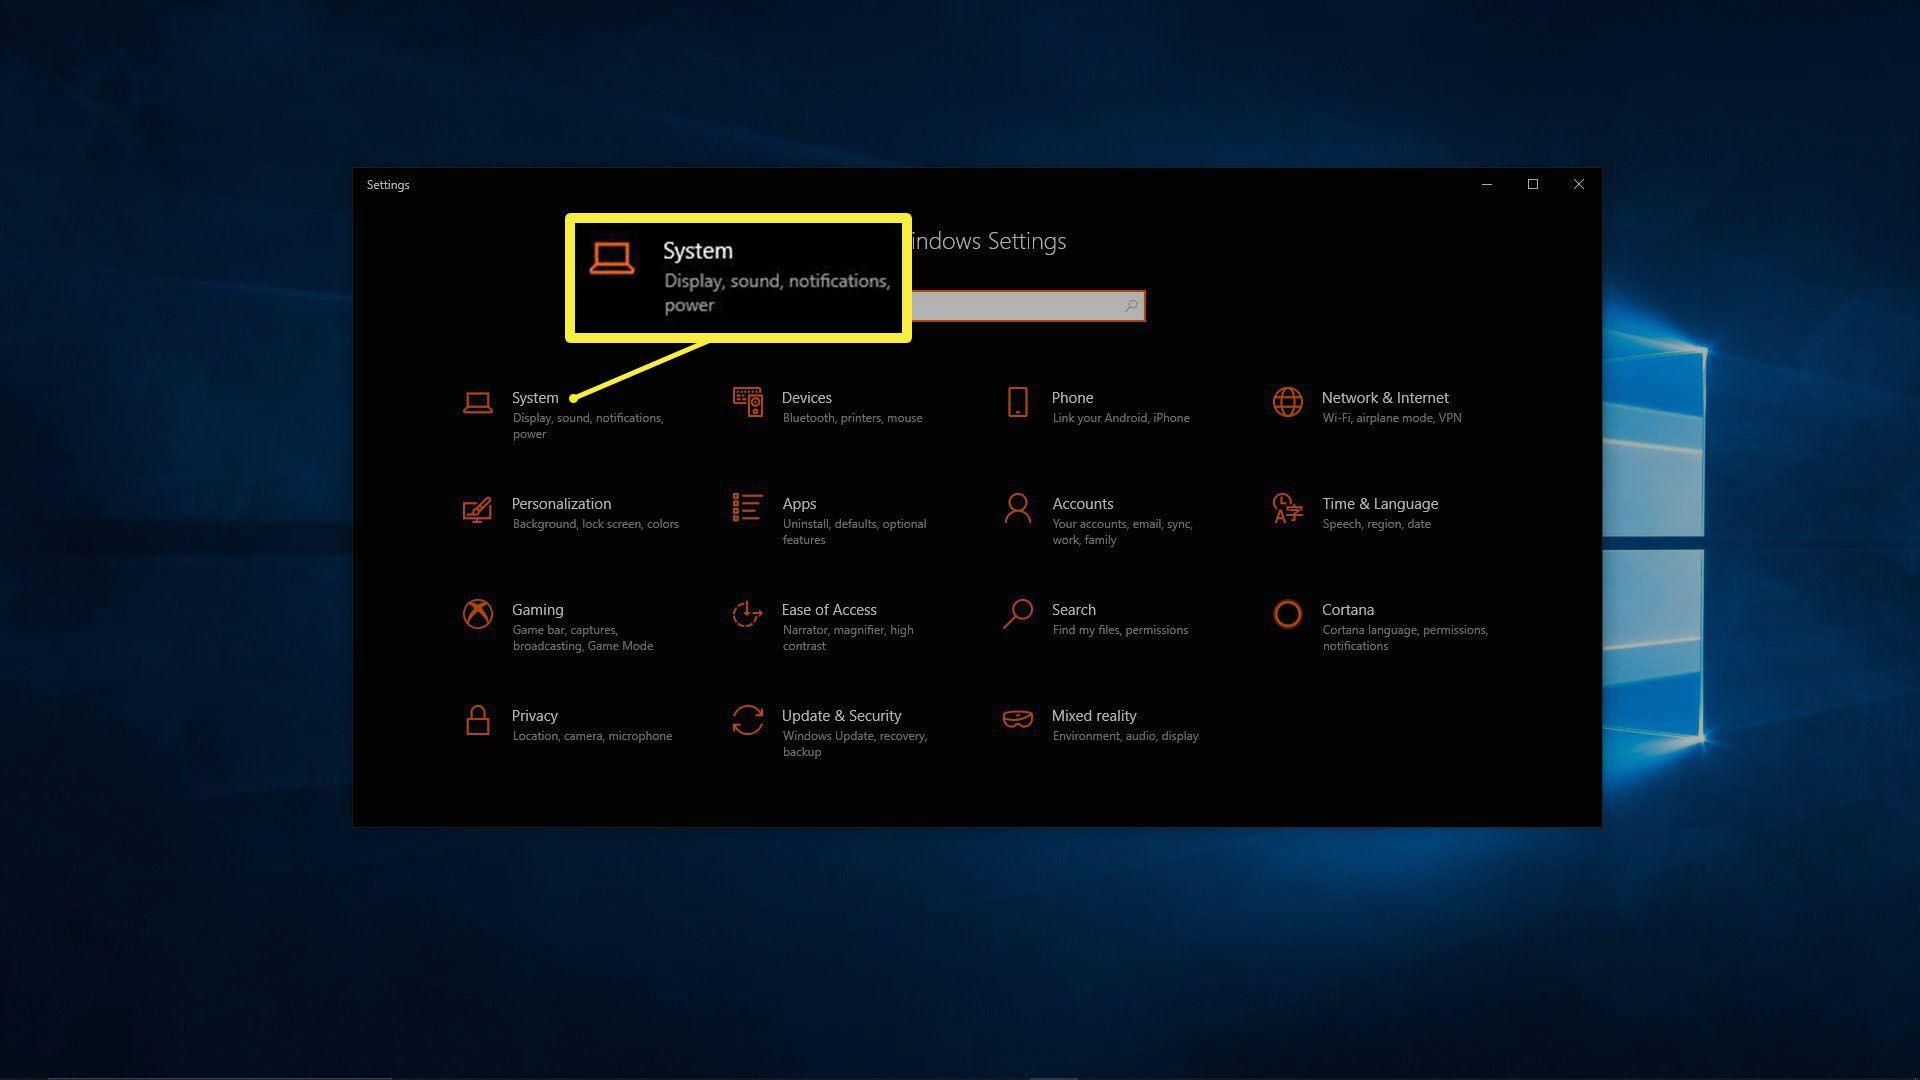 A screenshot of the Windows 10 Setting menu.